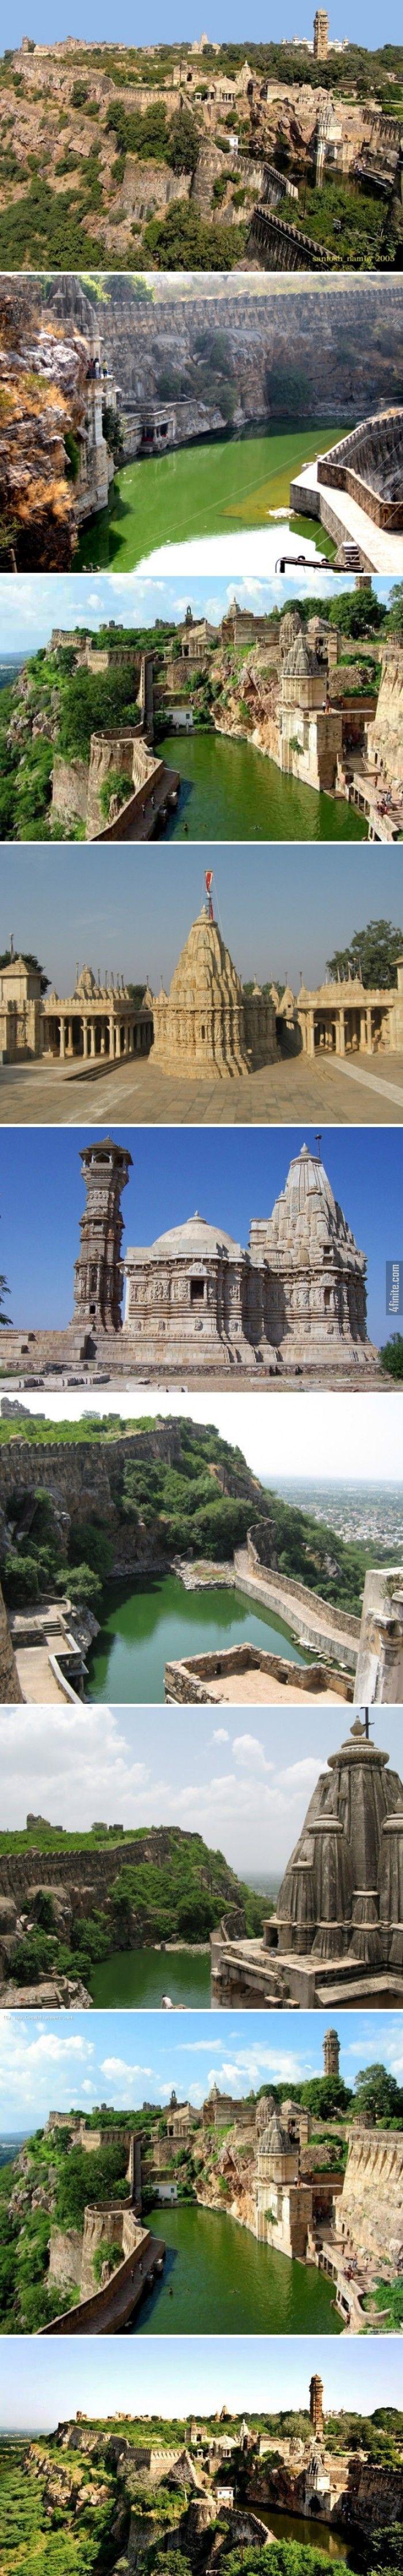 8 Fotoğrafta Zamanda Kaybolmuş Yer - Benteng Chittorgarh Fort Hindistan - 4finite.com